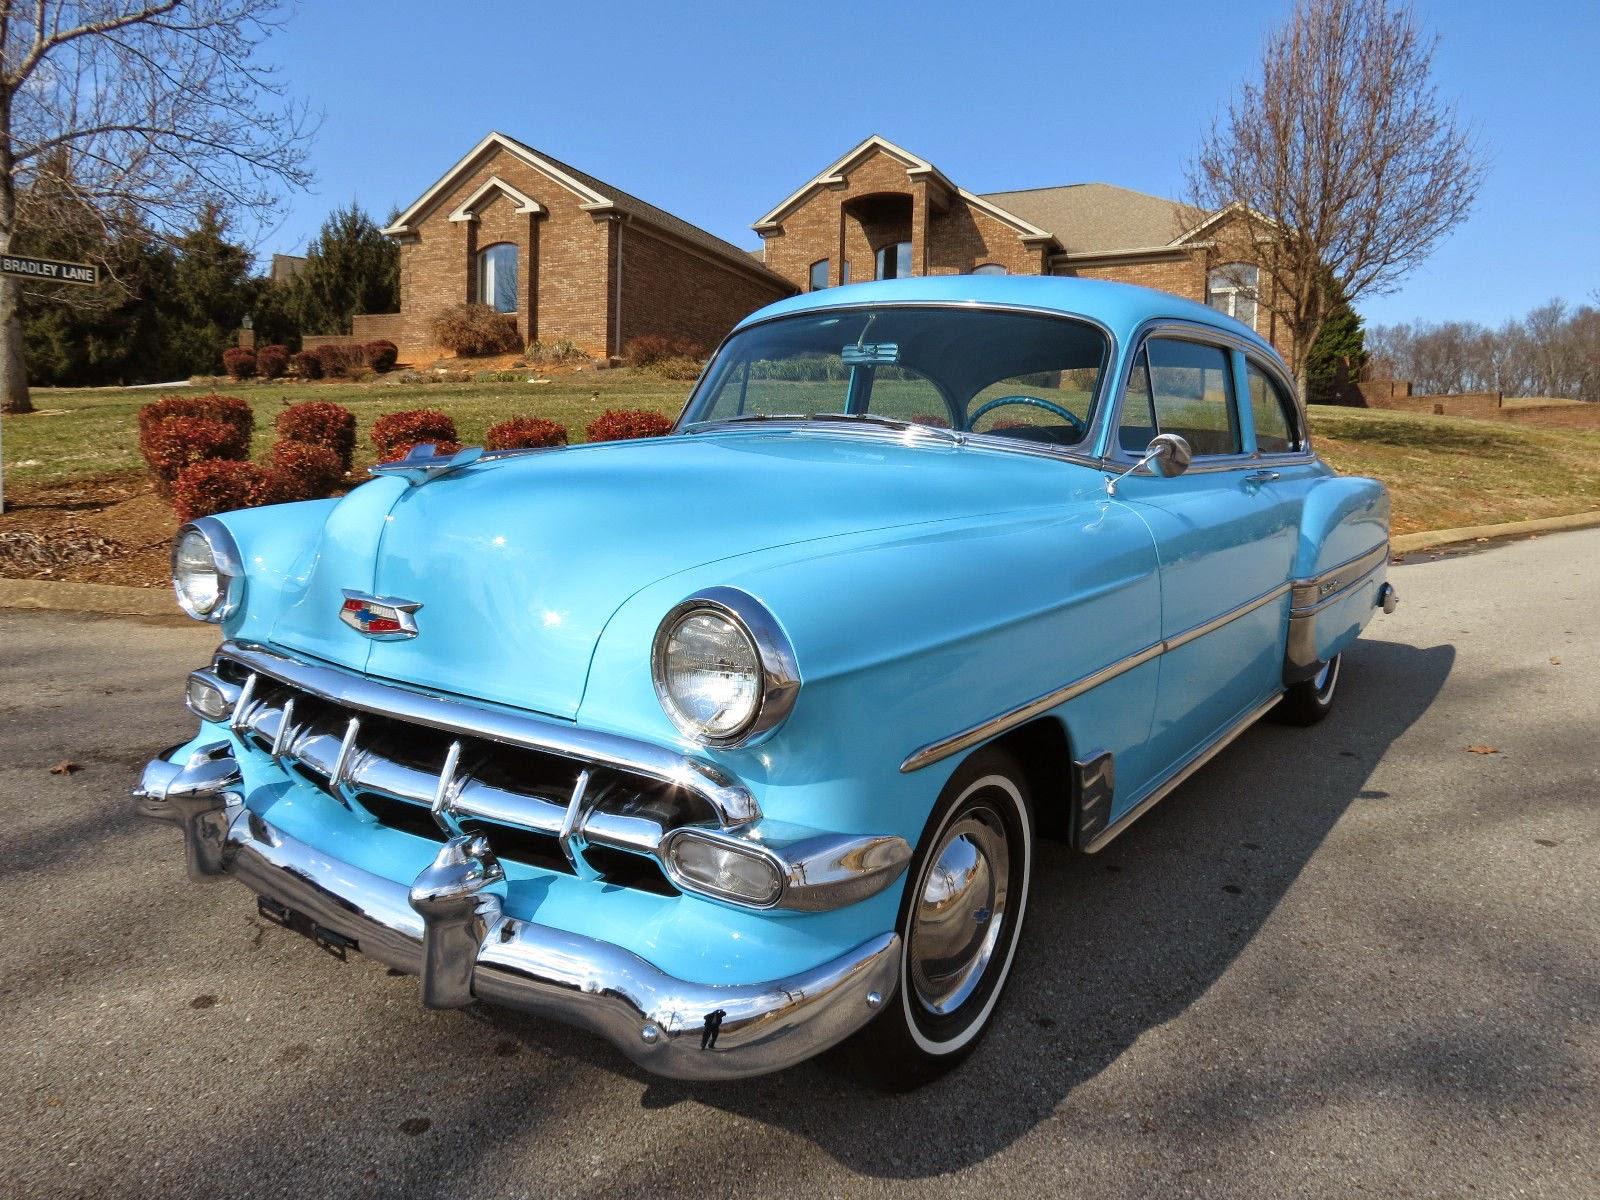 All American Classic Cars: 1954 Chevrolet Bel Air 2-Door Sedan